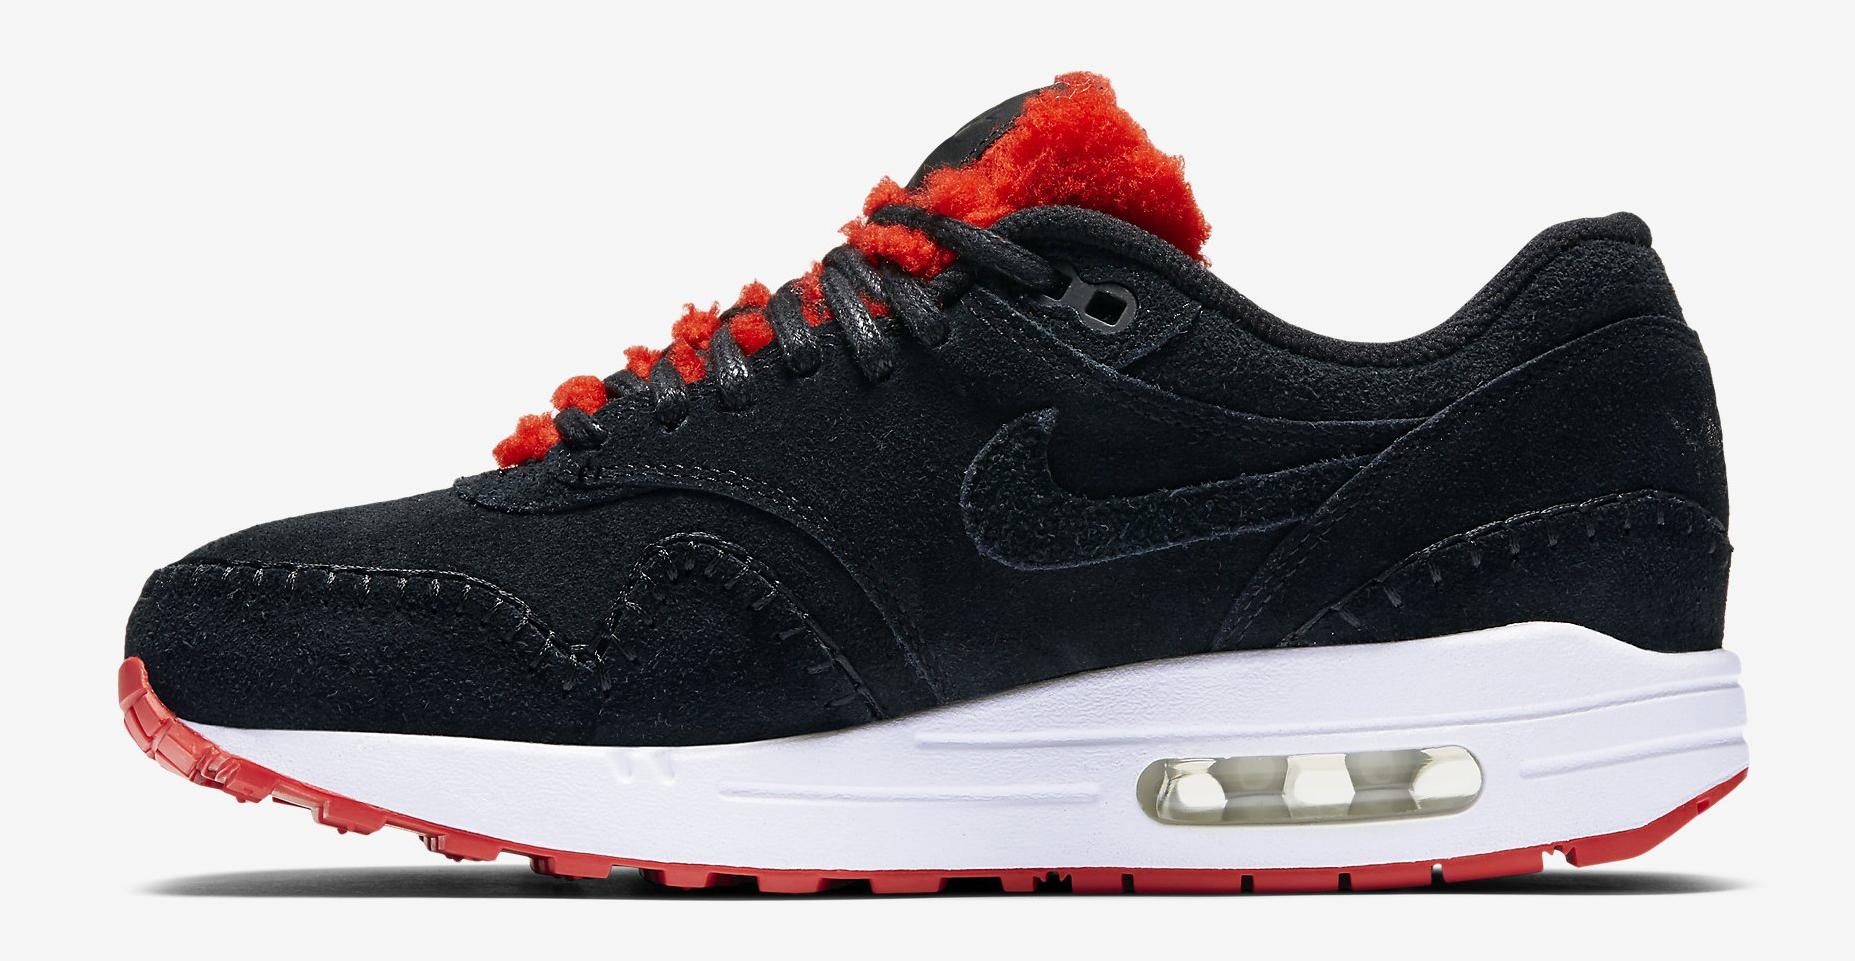 reputable site 07888 0bd8d Nike Air Max 1 Sherpa Black Red 454746-010 Medial